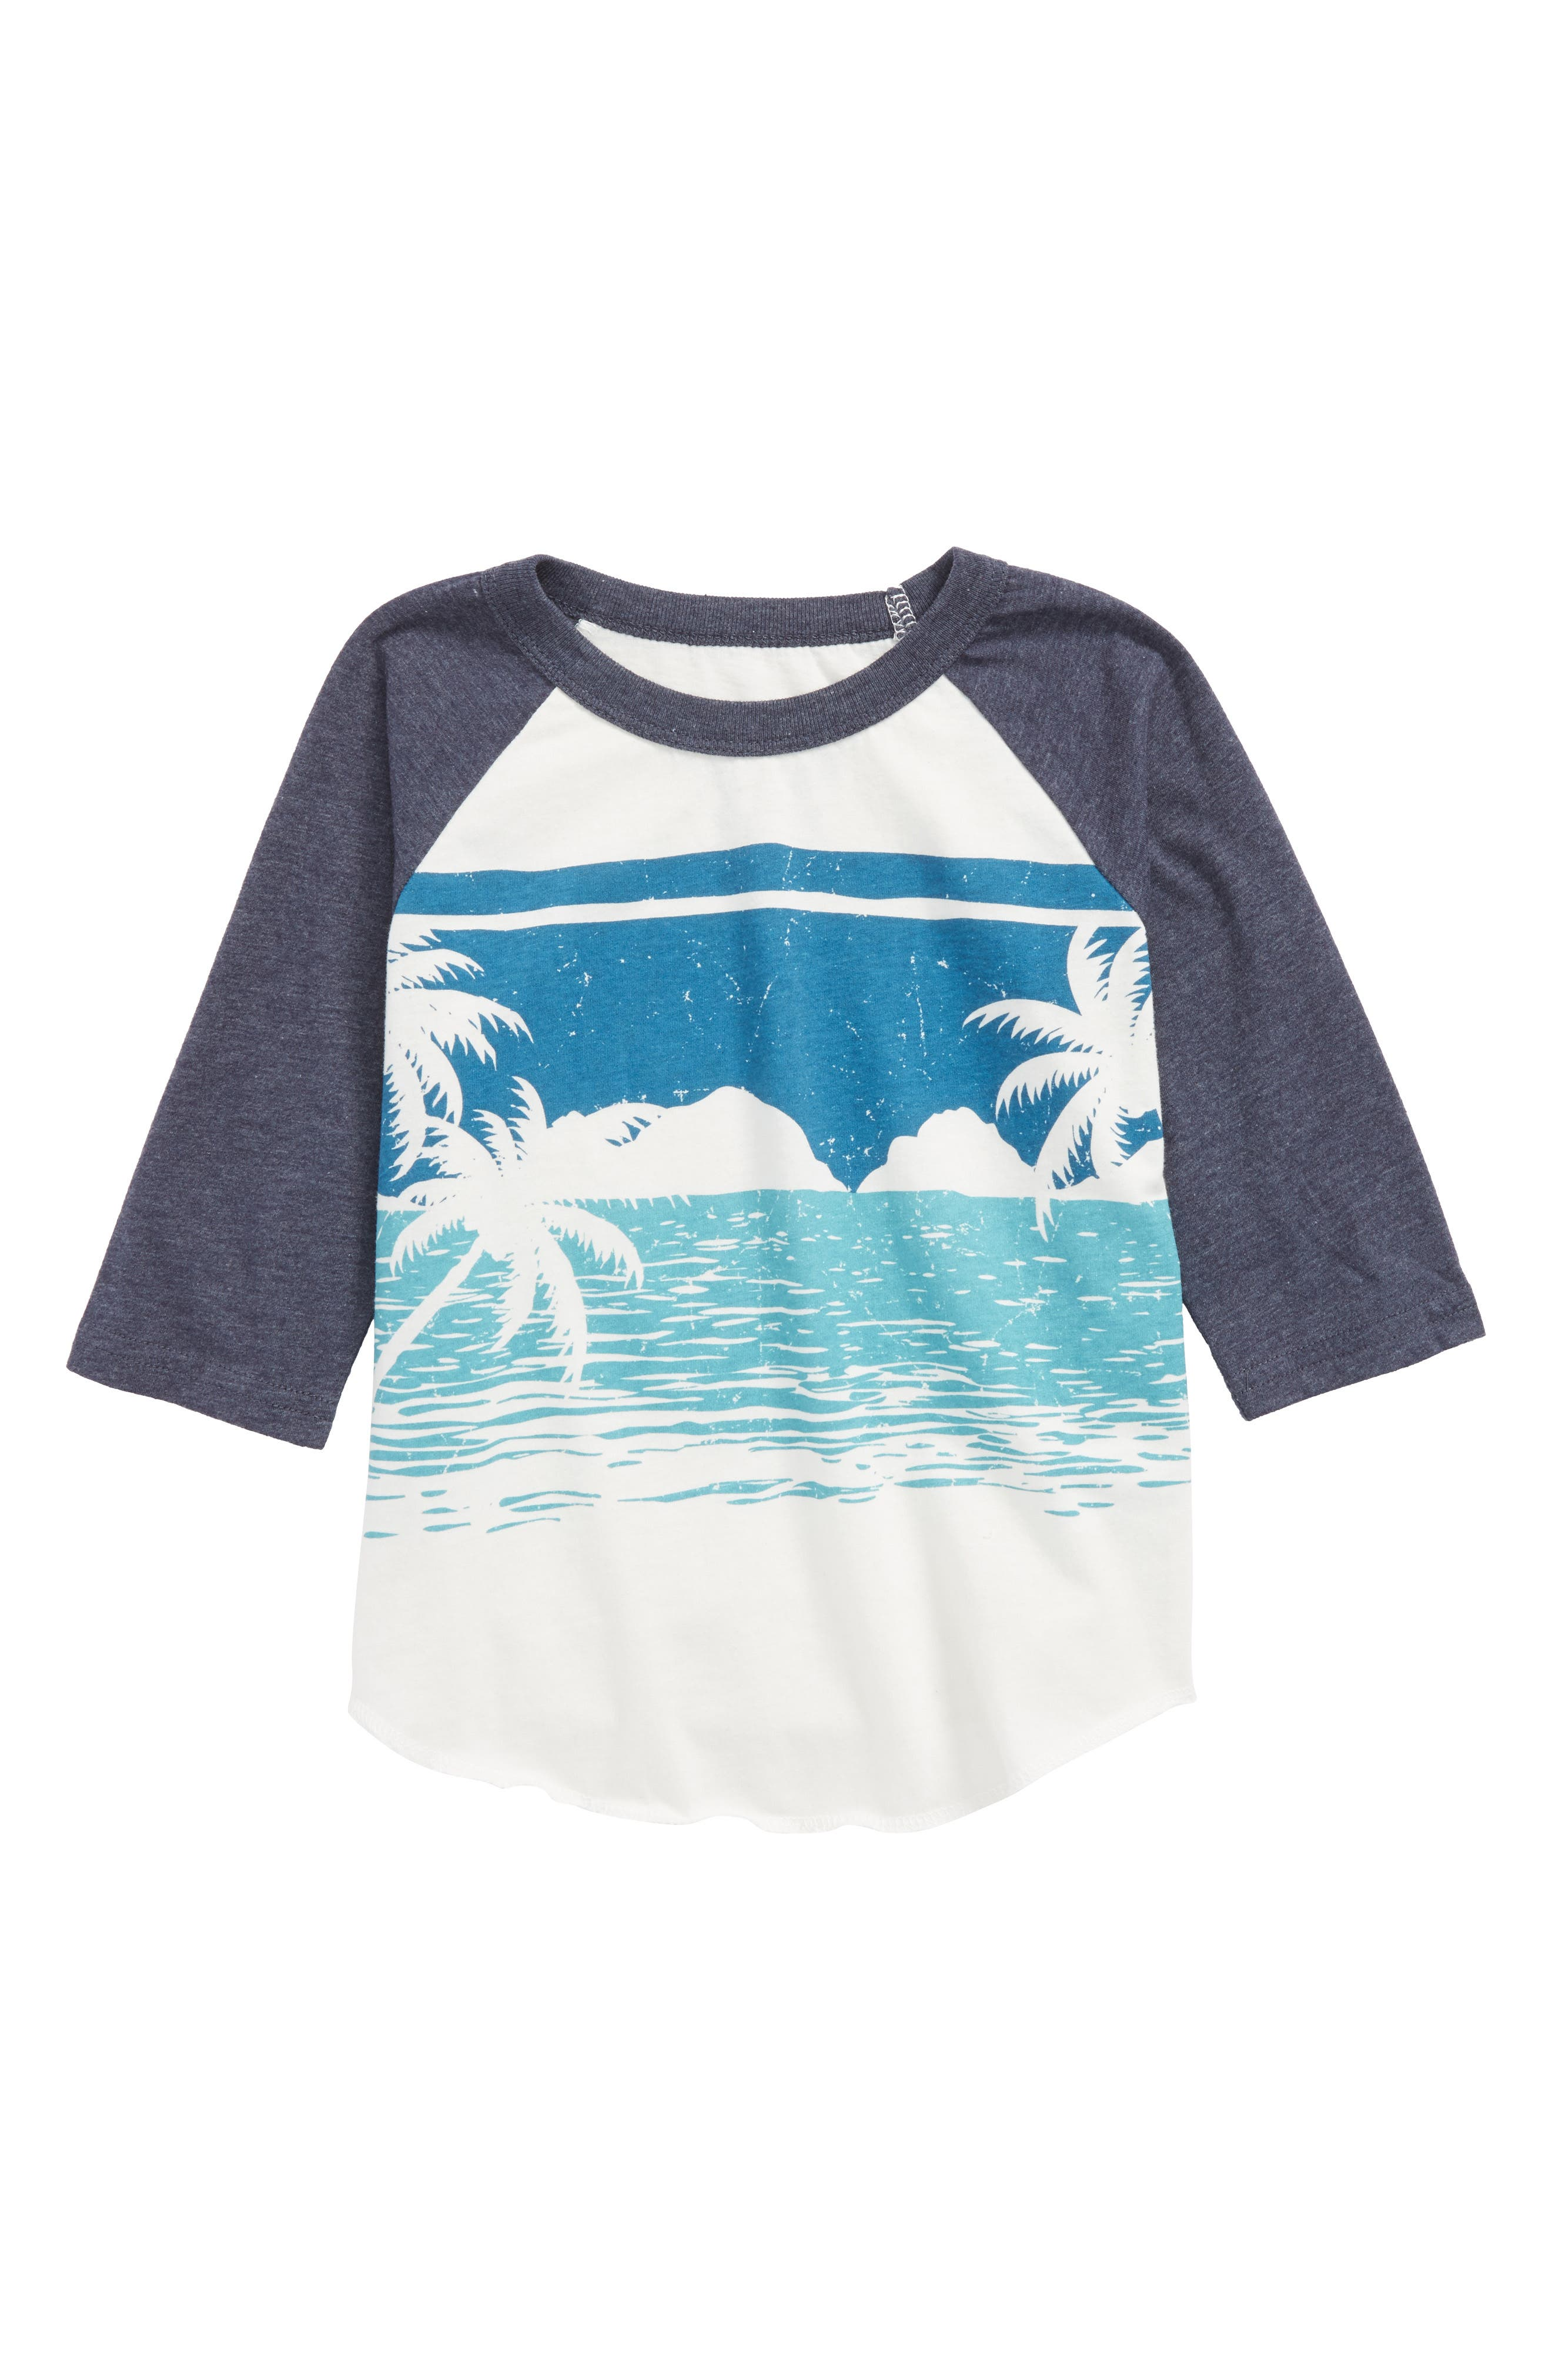 Main Image - Chaser Ocean View Raglan T-Shirt (Toddler Boys, Little Boys & Big Boys)